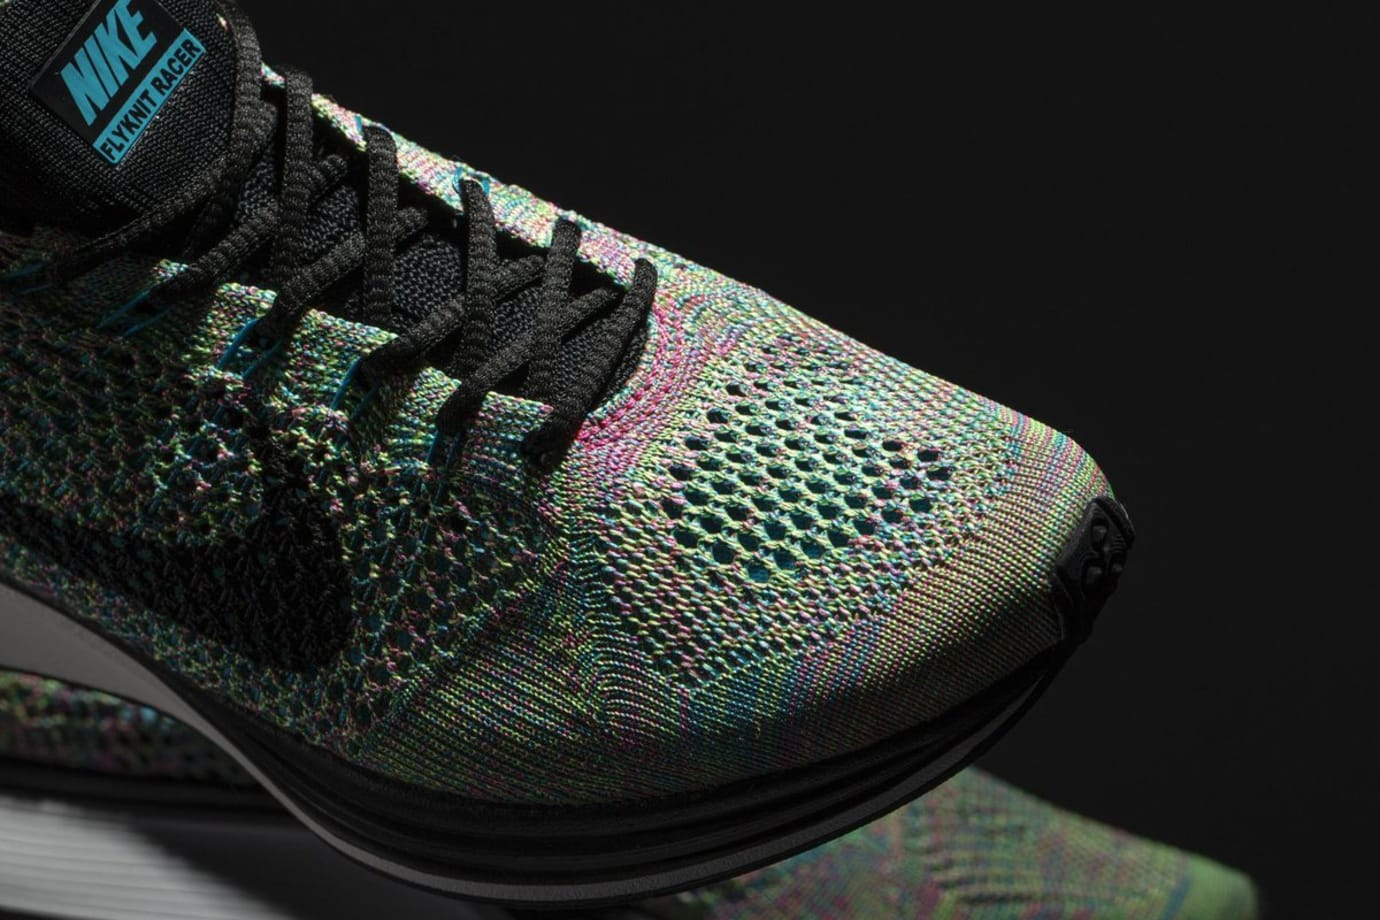 big sale 90806 fac80 Image via CNCPTS Multicolor Nike Flyknit 2017 Tongue